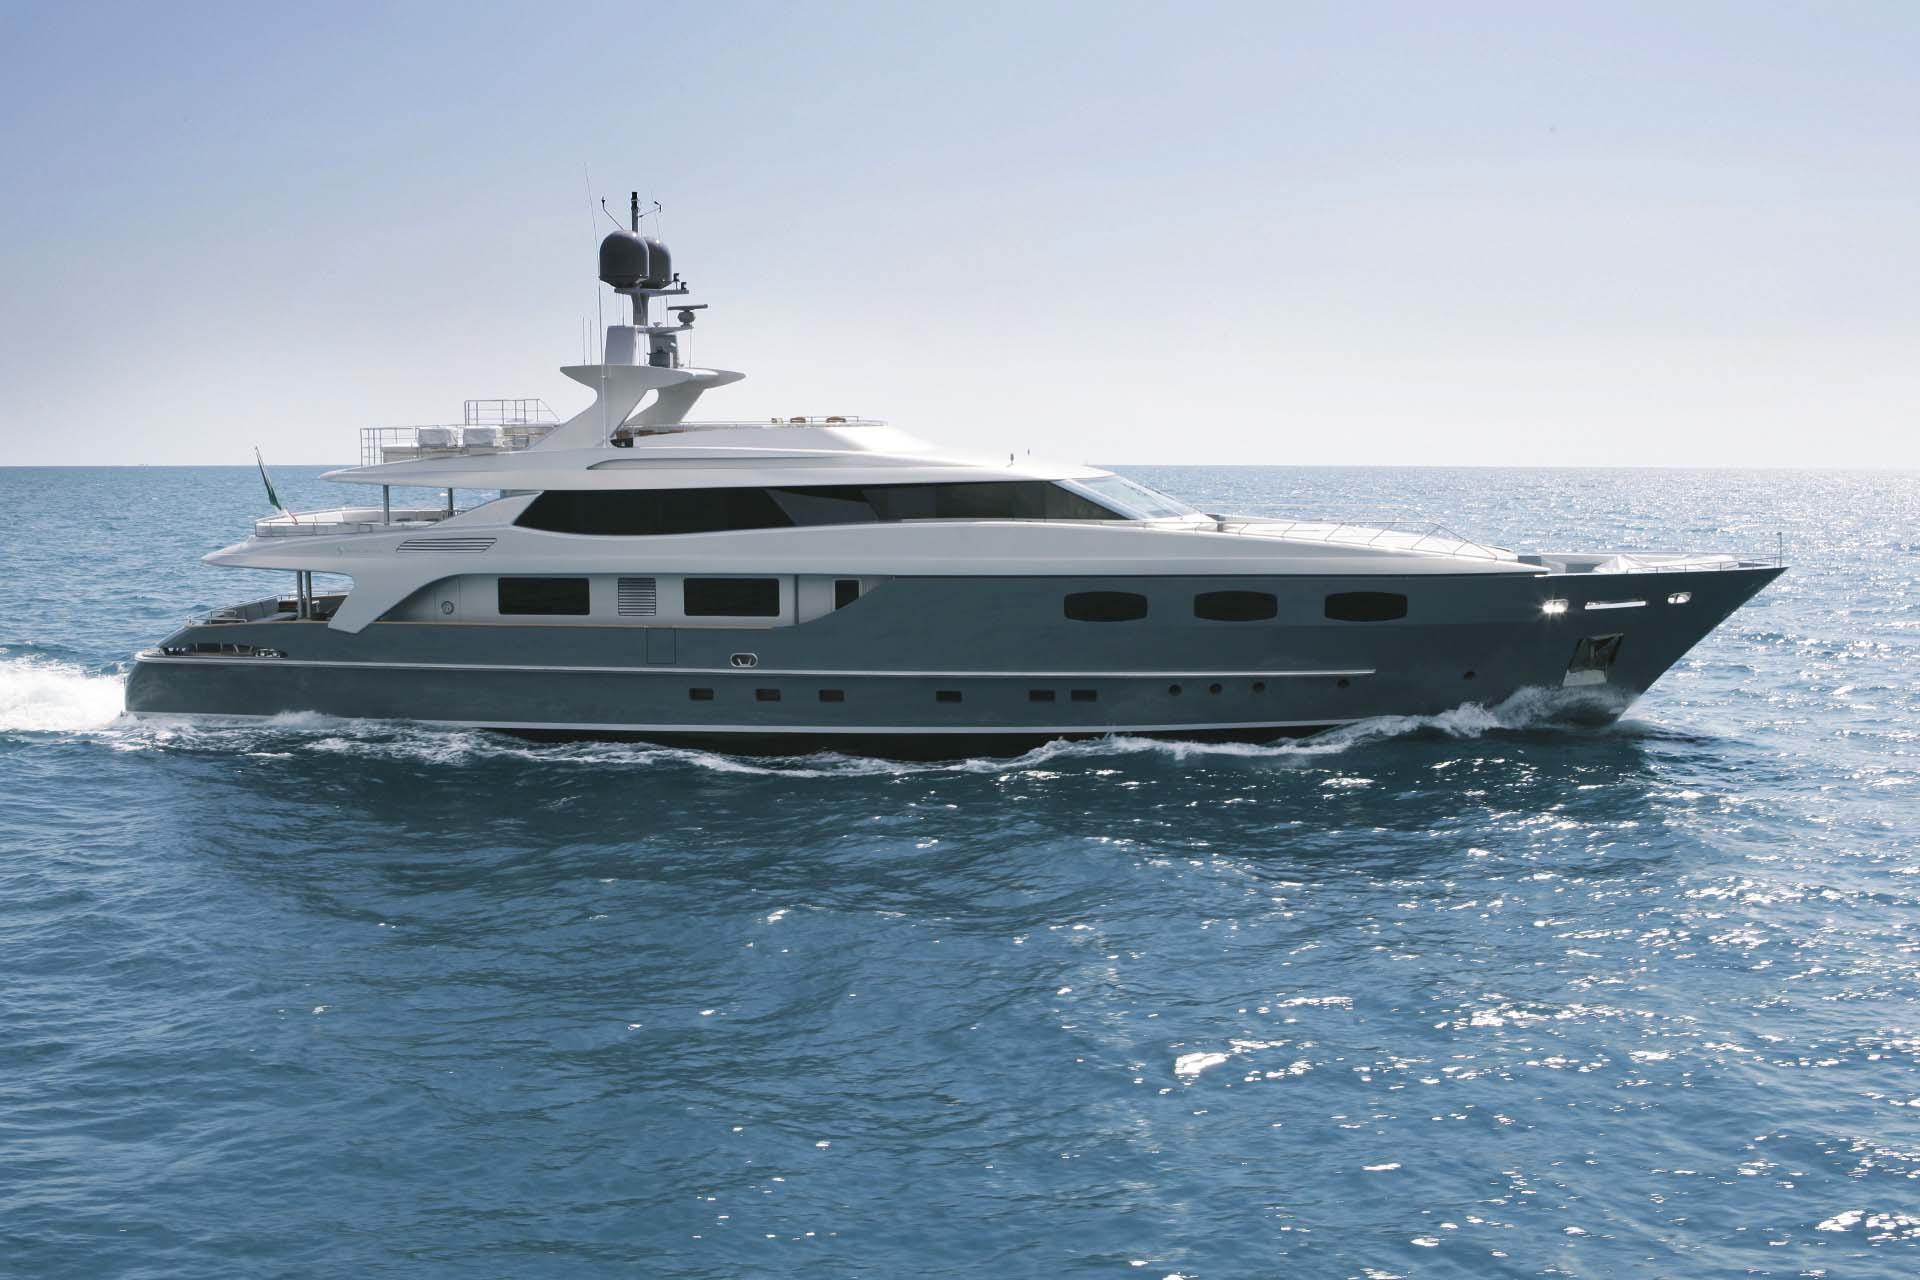 baglietto - ANNAMIA - Paskowsky Yacht Design